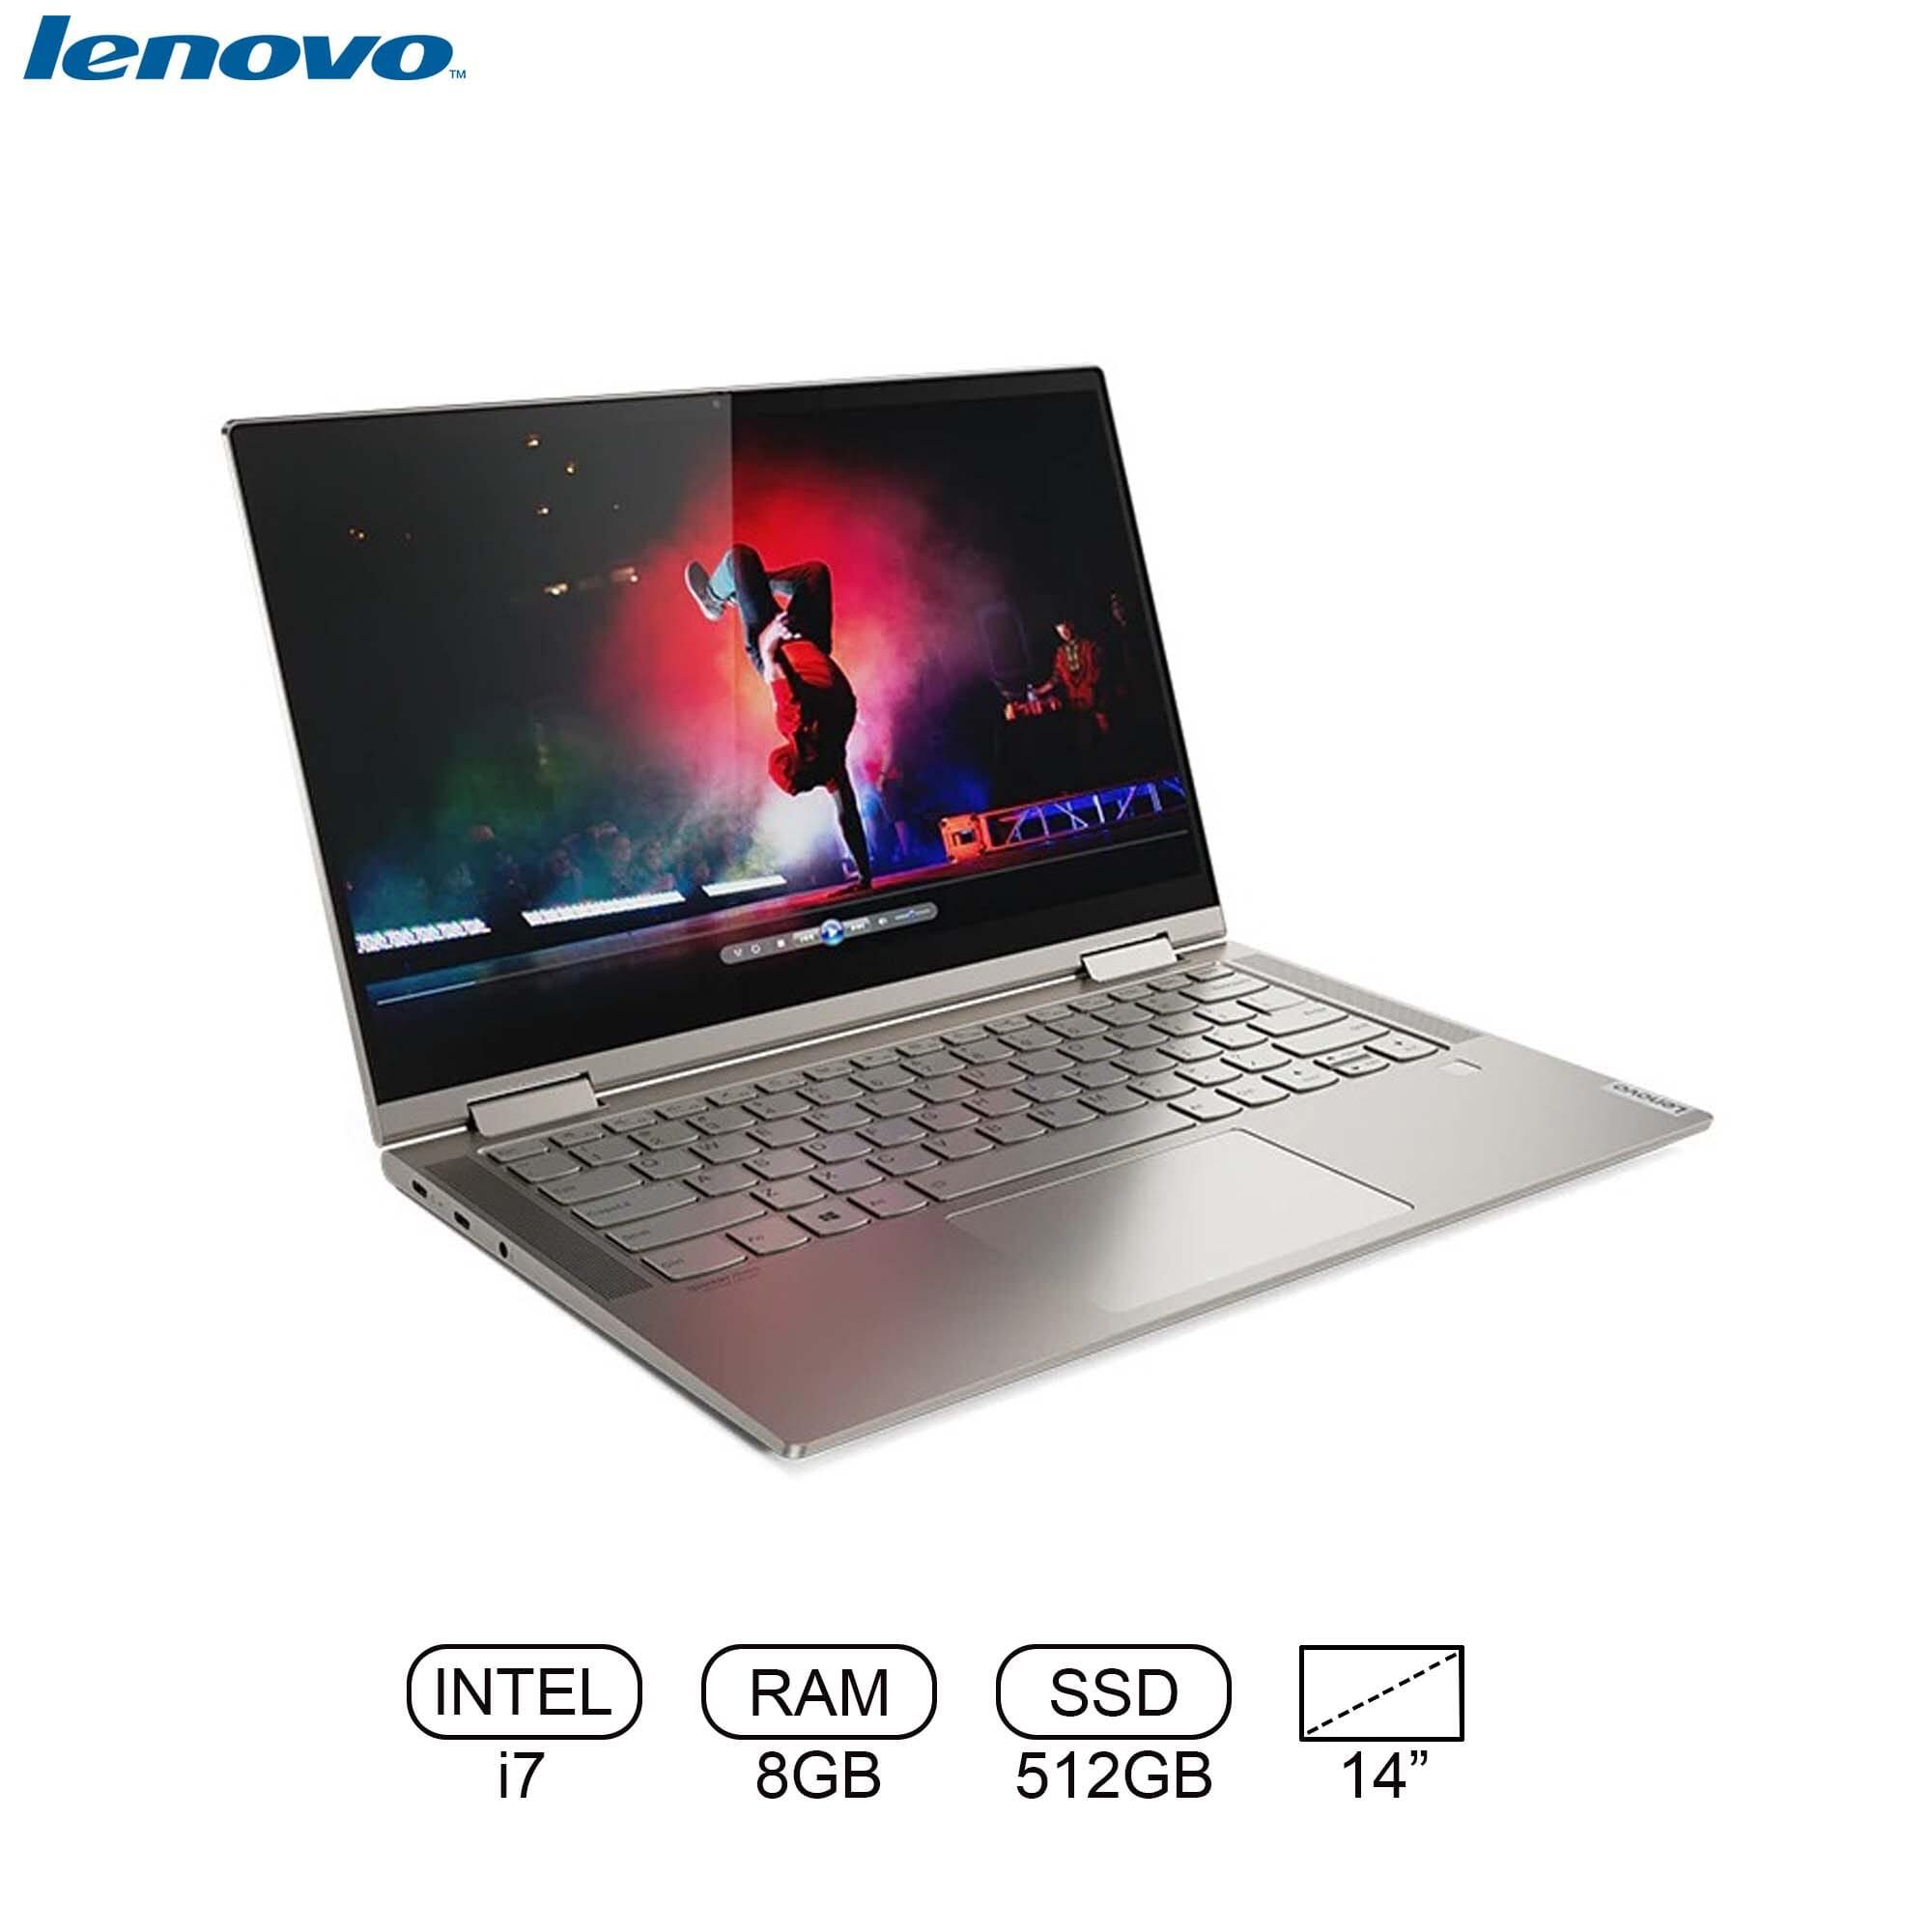 "Lenovo Yoga C740 i7 10th/ 8GB/ 512ssd/ 14""x 360 Laptop"